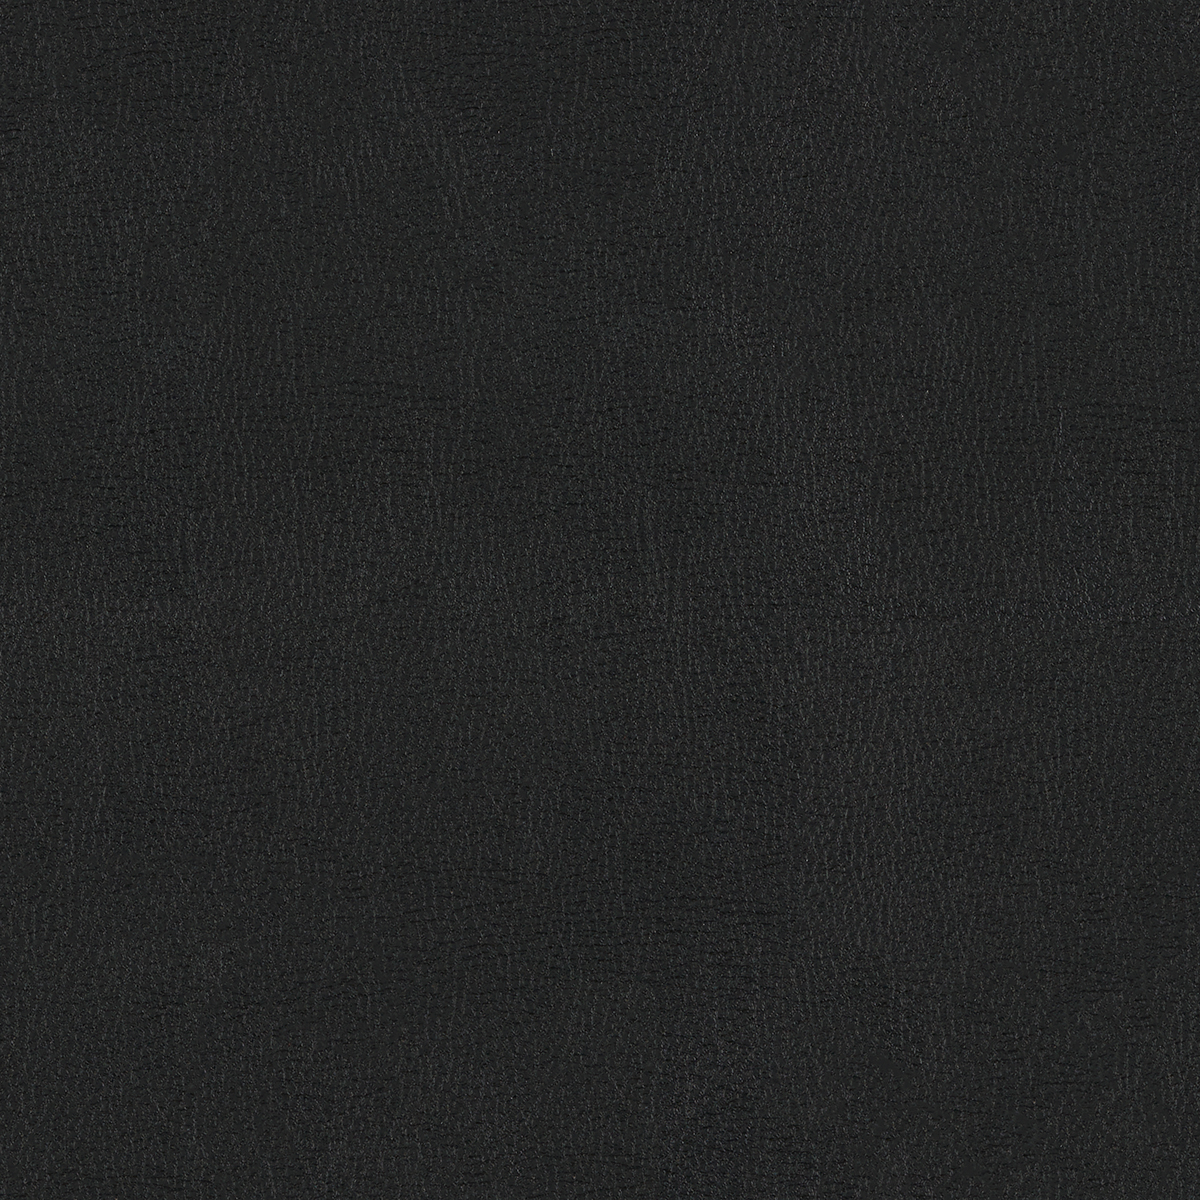 Top Coat - Black Oxide - 4083 - 18 - Half Yard Tileable Swatches